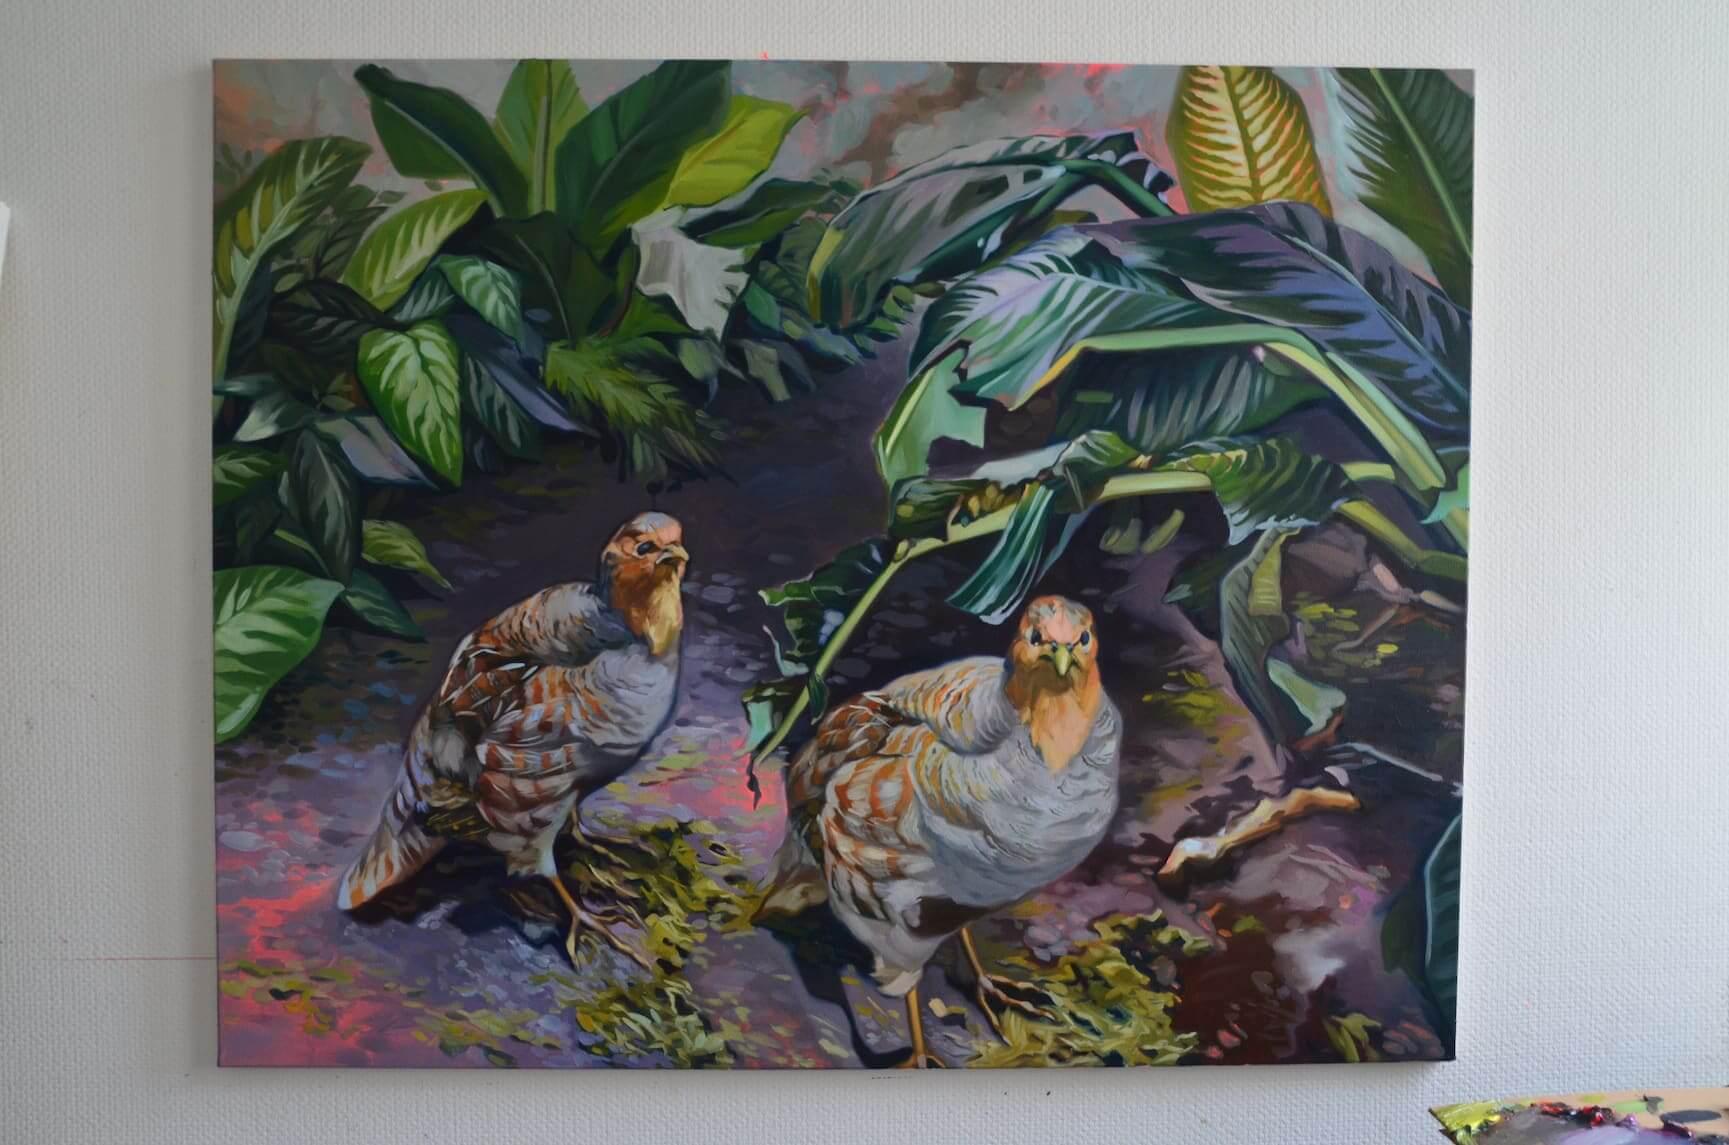 Apokalypsenhühner, 140x 120cm, Öl auf Leinwand, 2020 Hanne Kroll